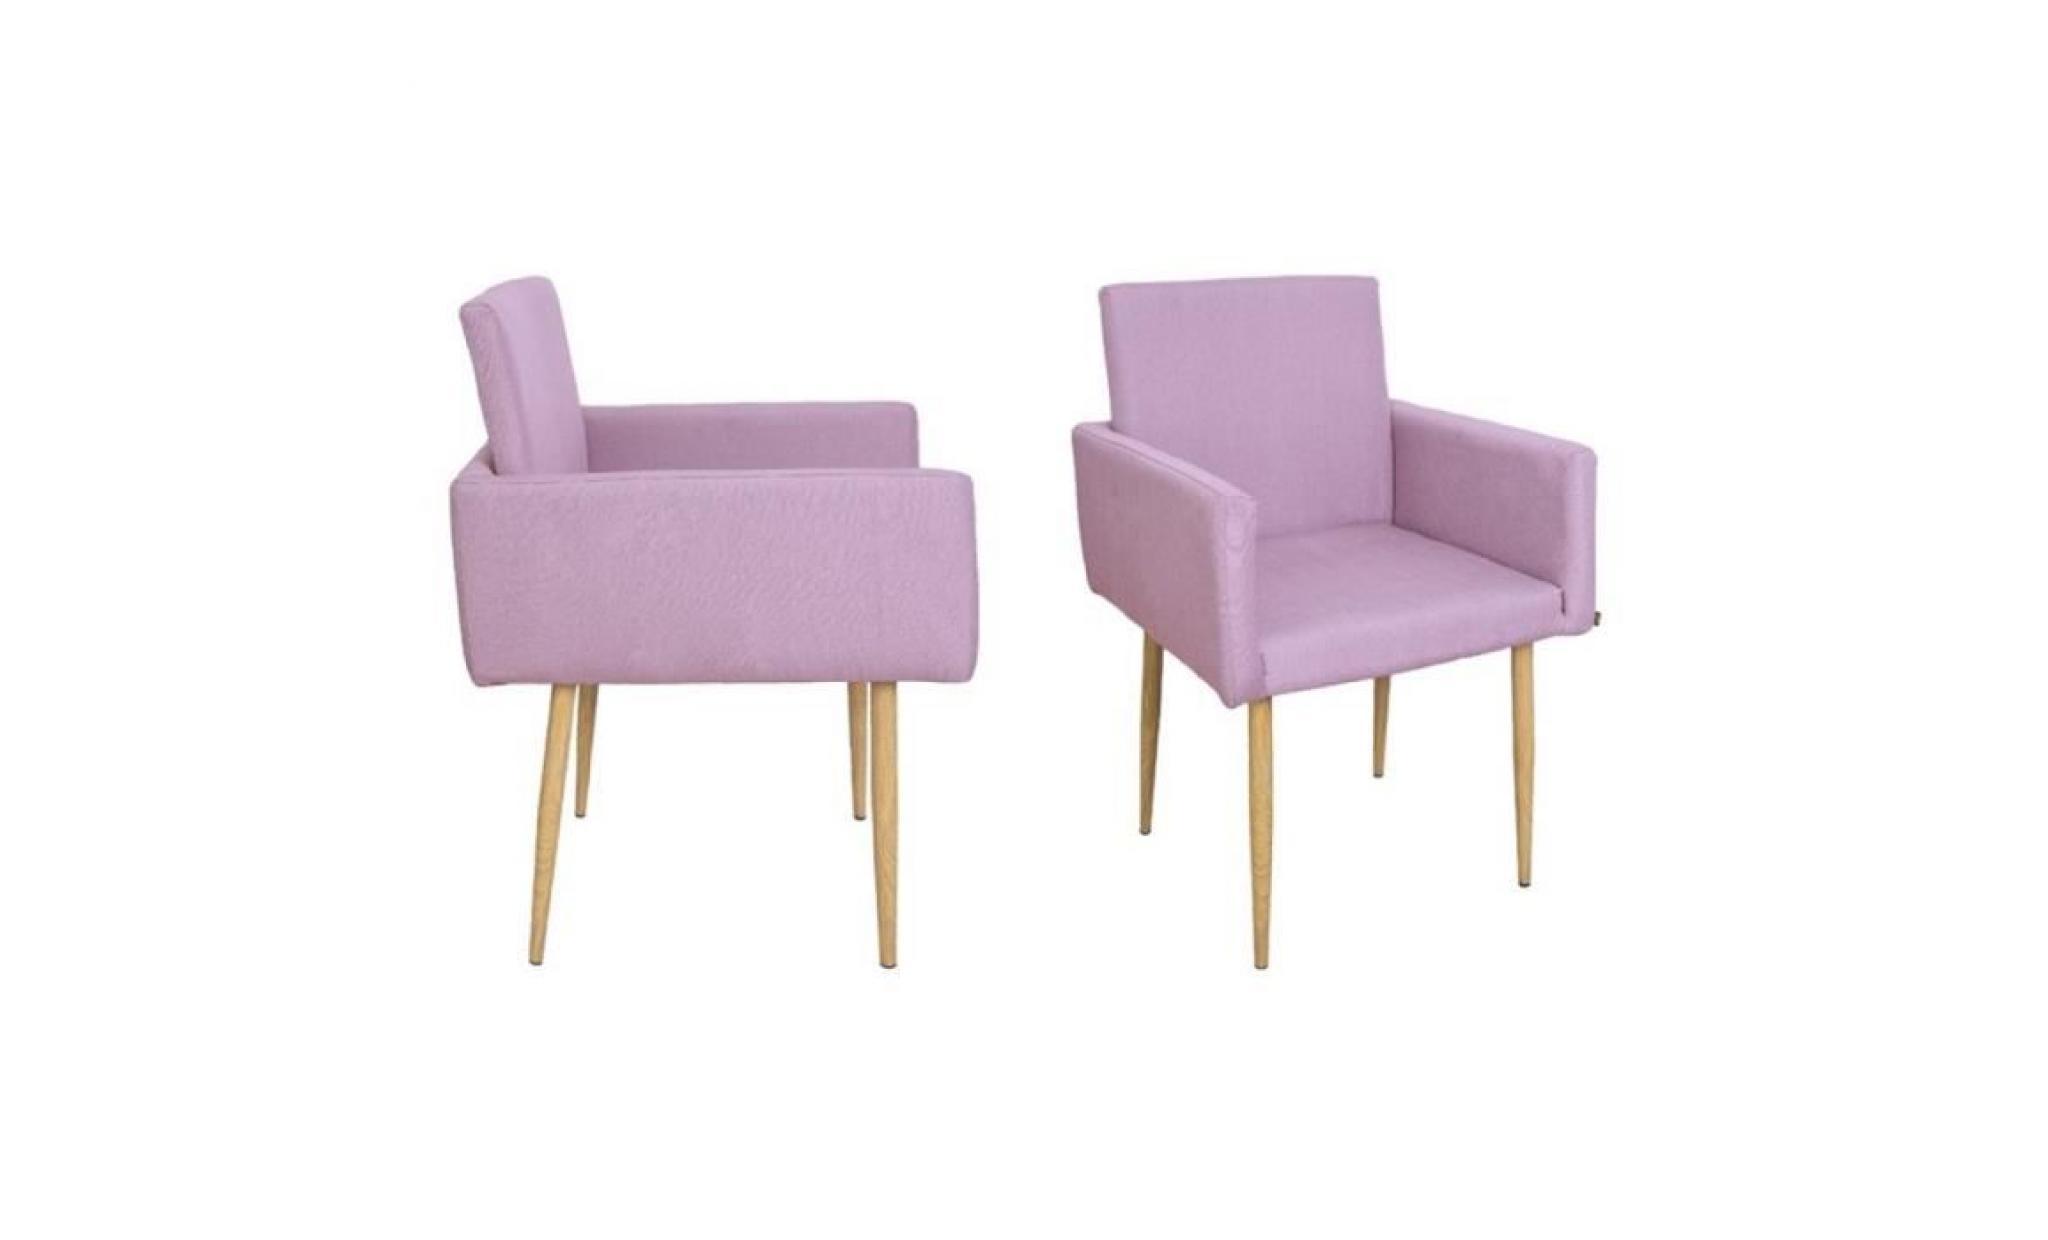 pav fauteuil en tissu 55x58xh90cm rose